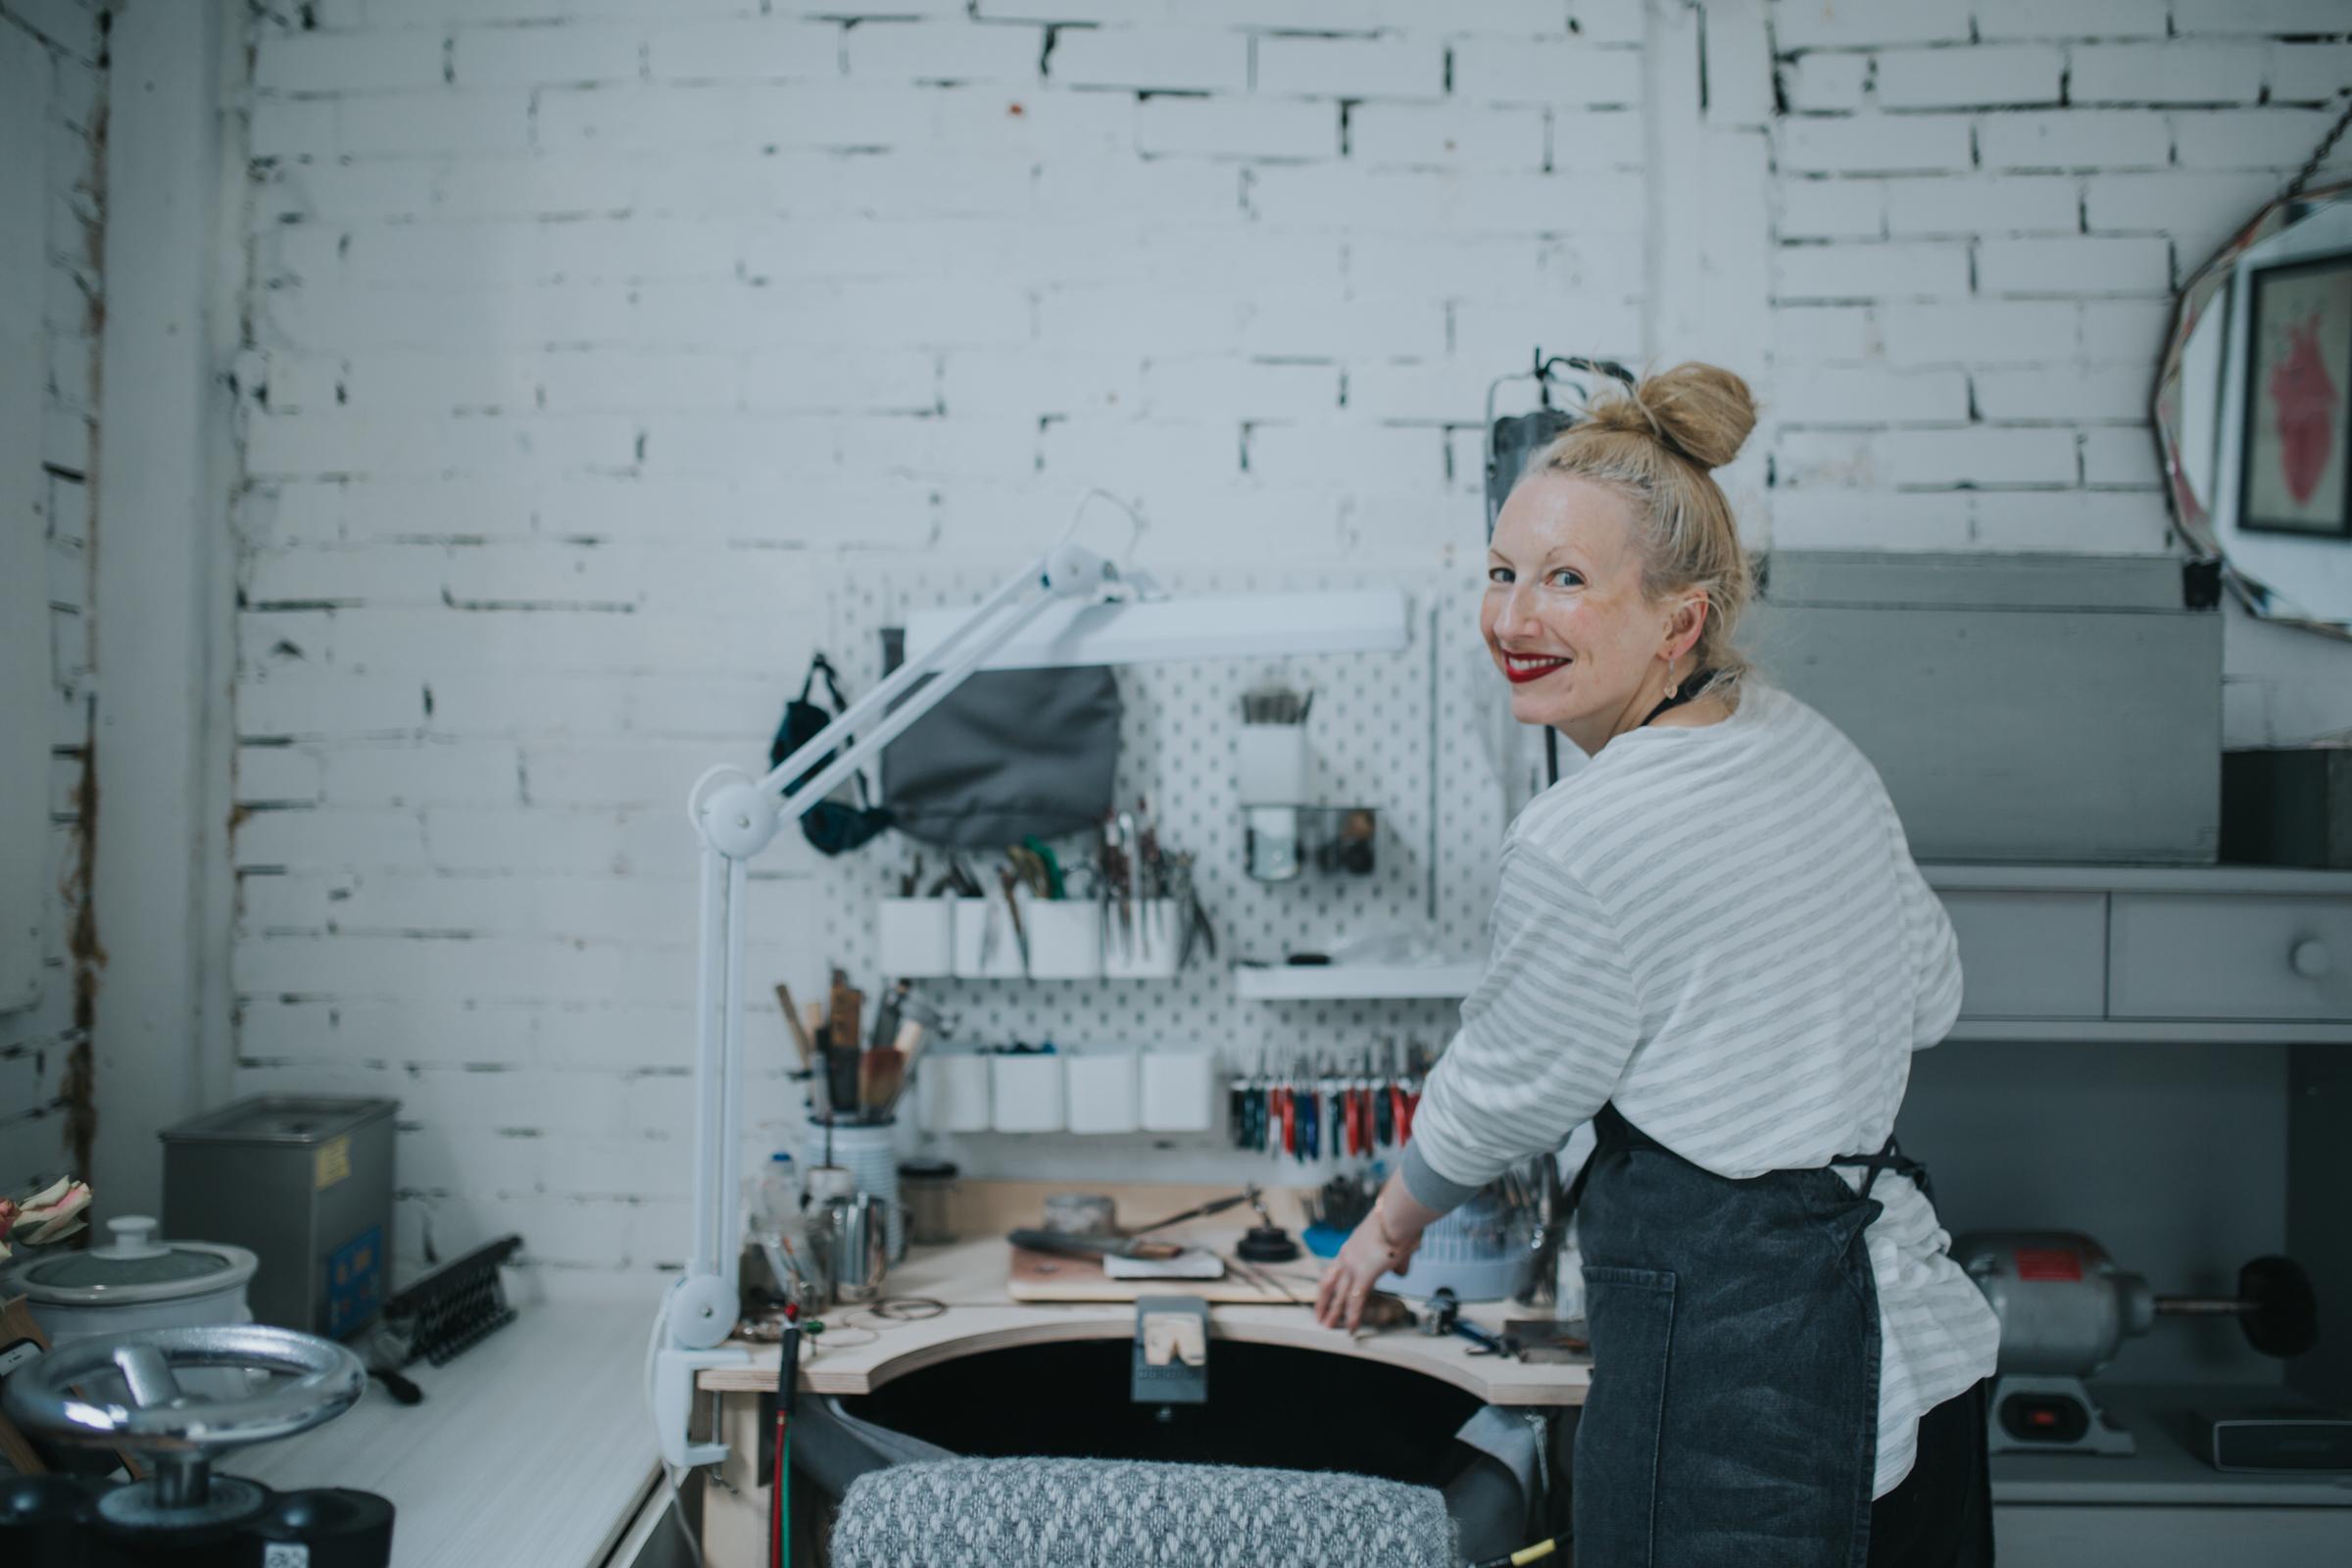 interview-jo-tootsievalentine-fine-designer-jewellery-fair-trade-gold-minas-planet-jasmina-haskovic-london-uk20.jpg